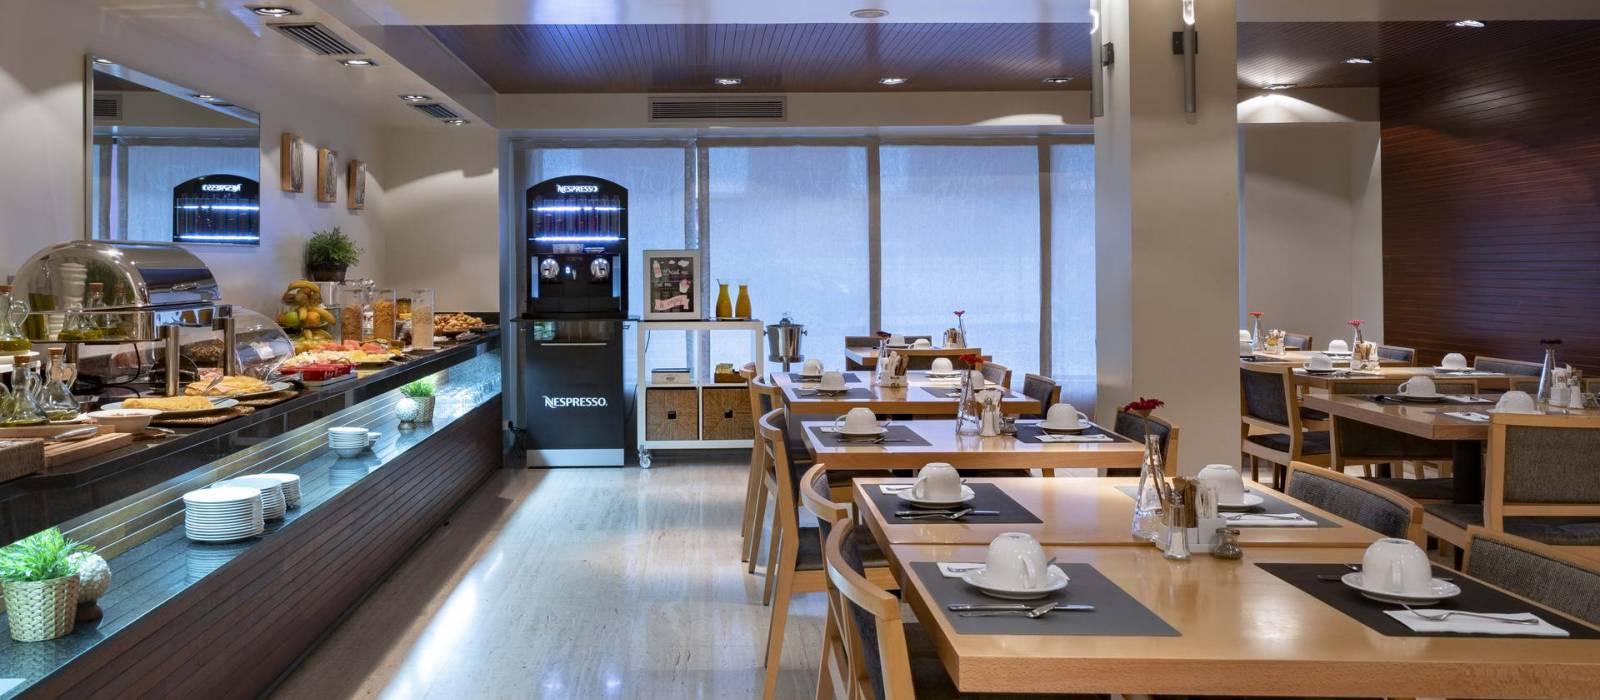 Services Hôtel Puertochico Santander - Vincci Hoteles - Buffet